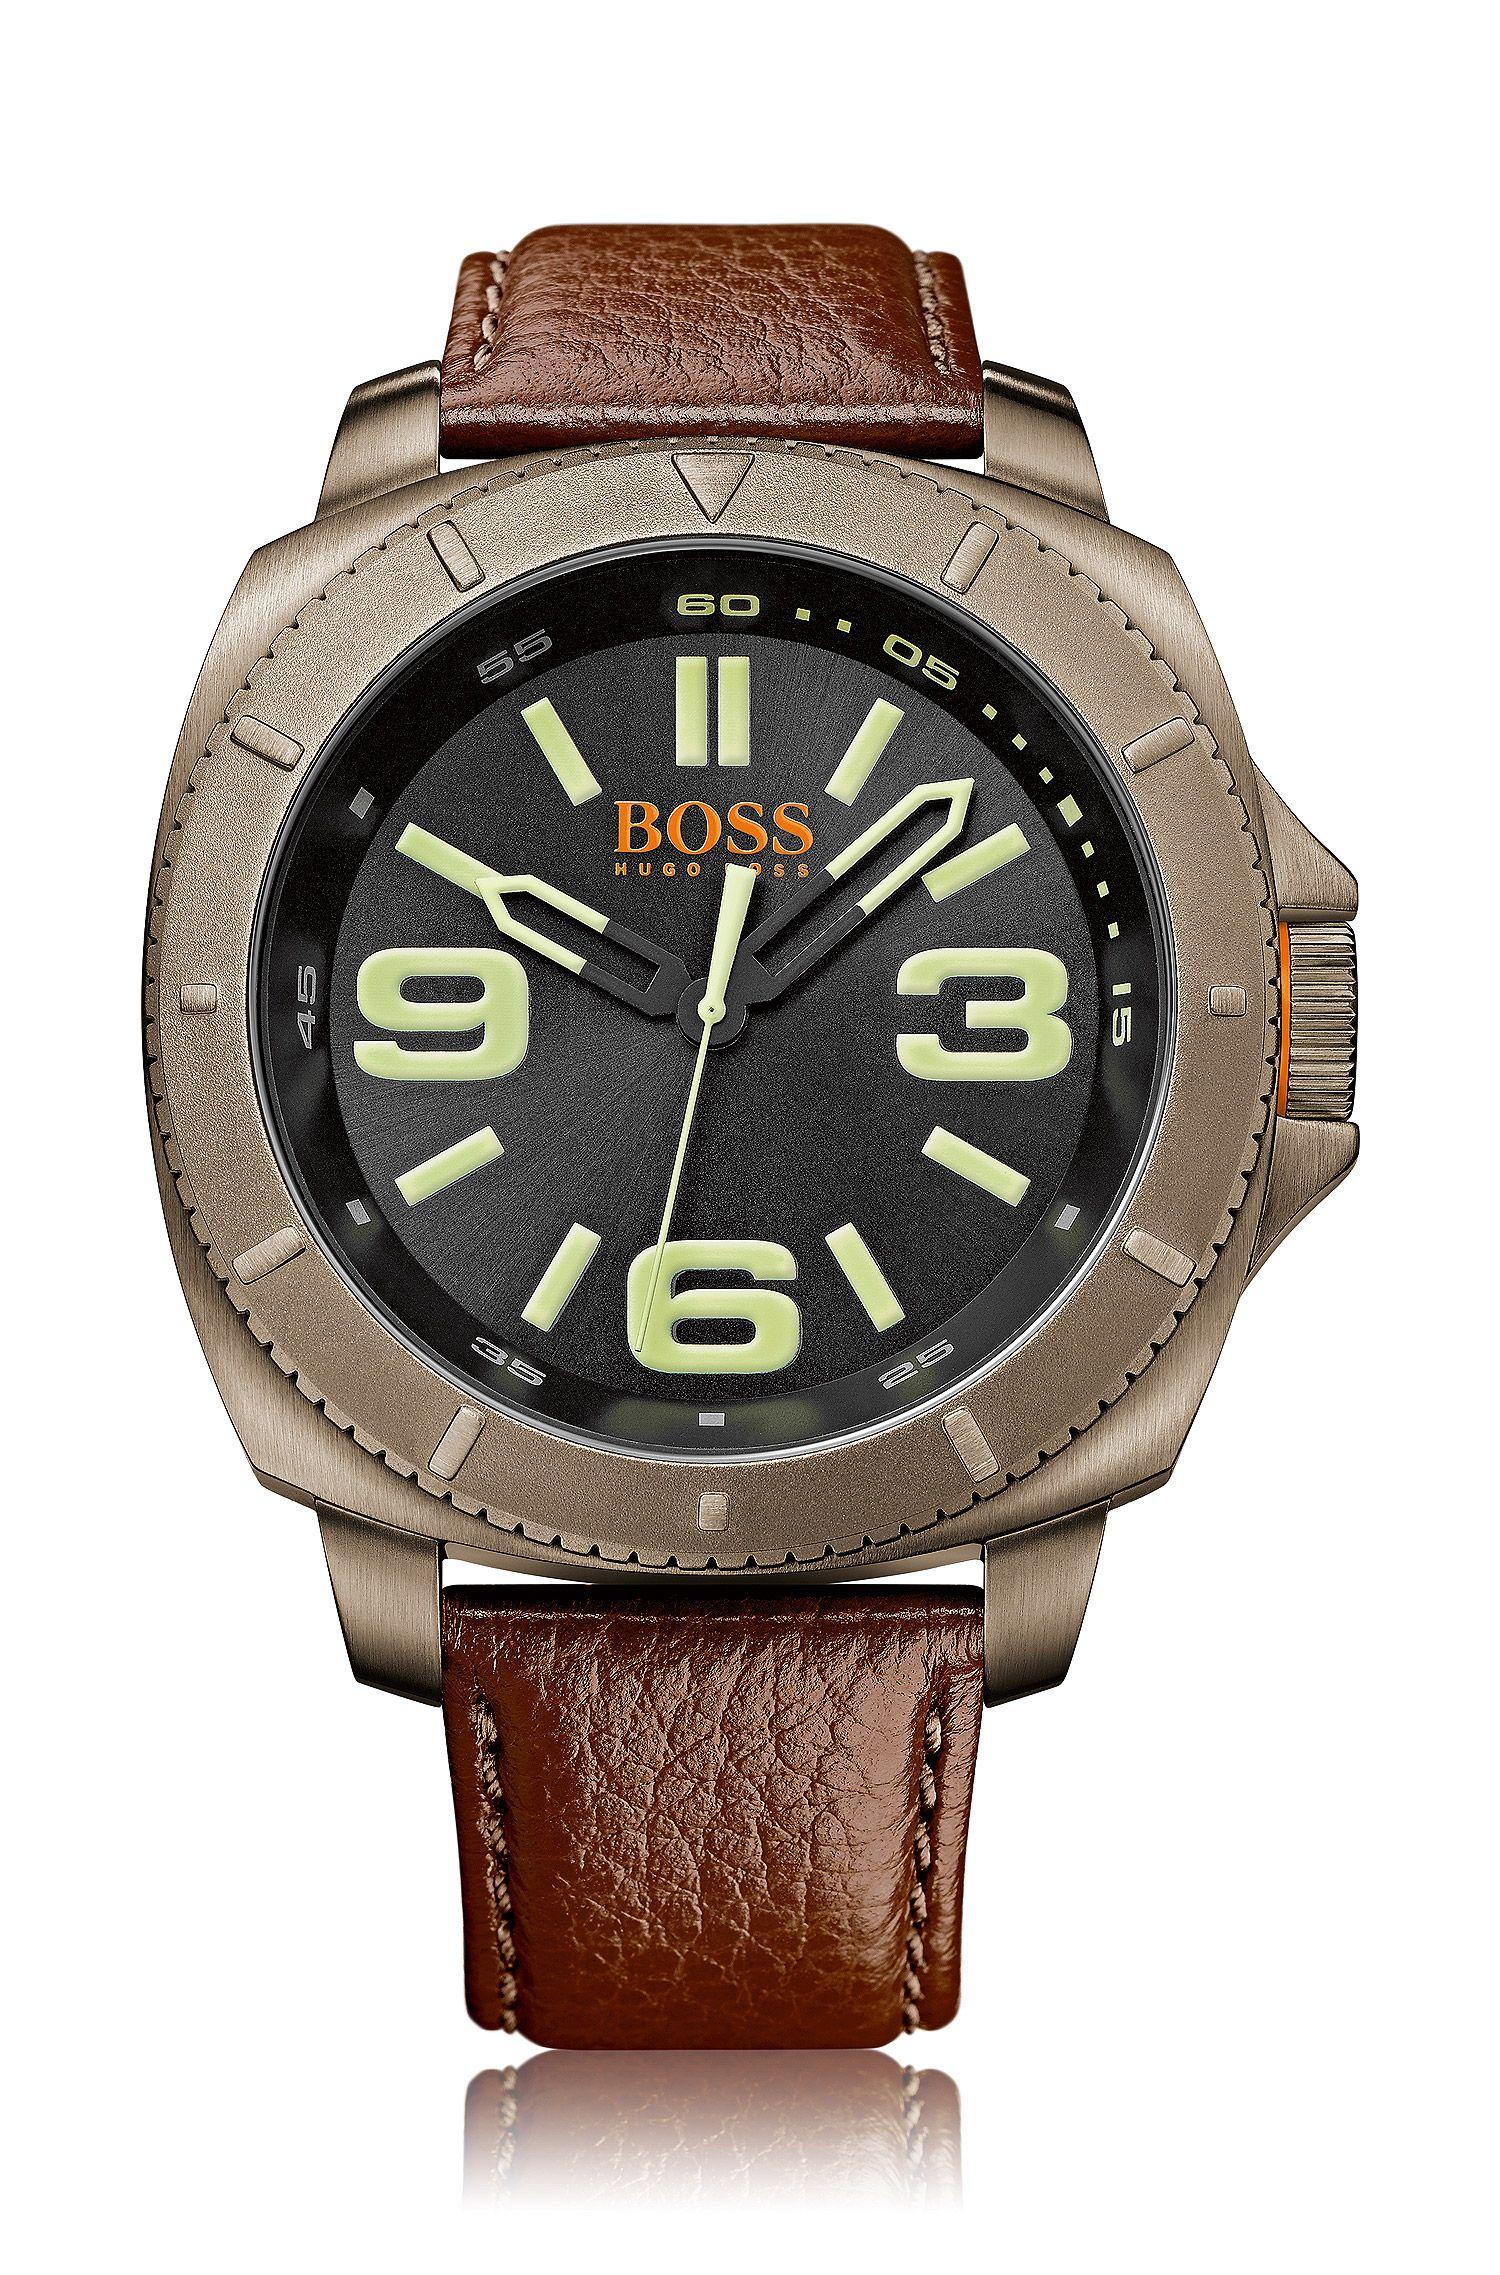 Wristwatch 'HOSAOPO' with a leather strap